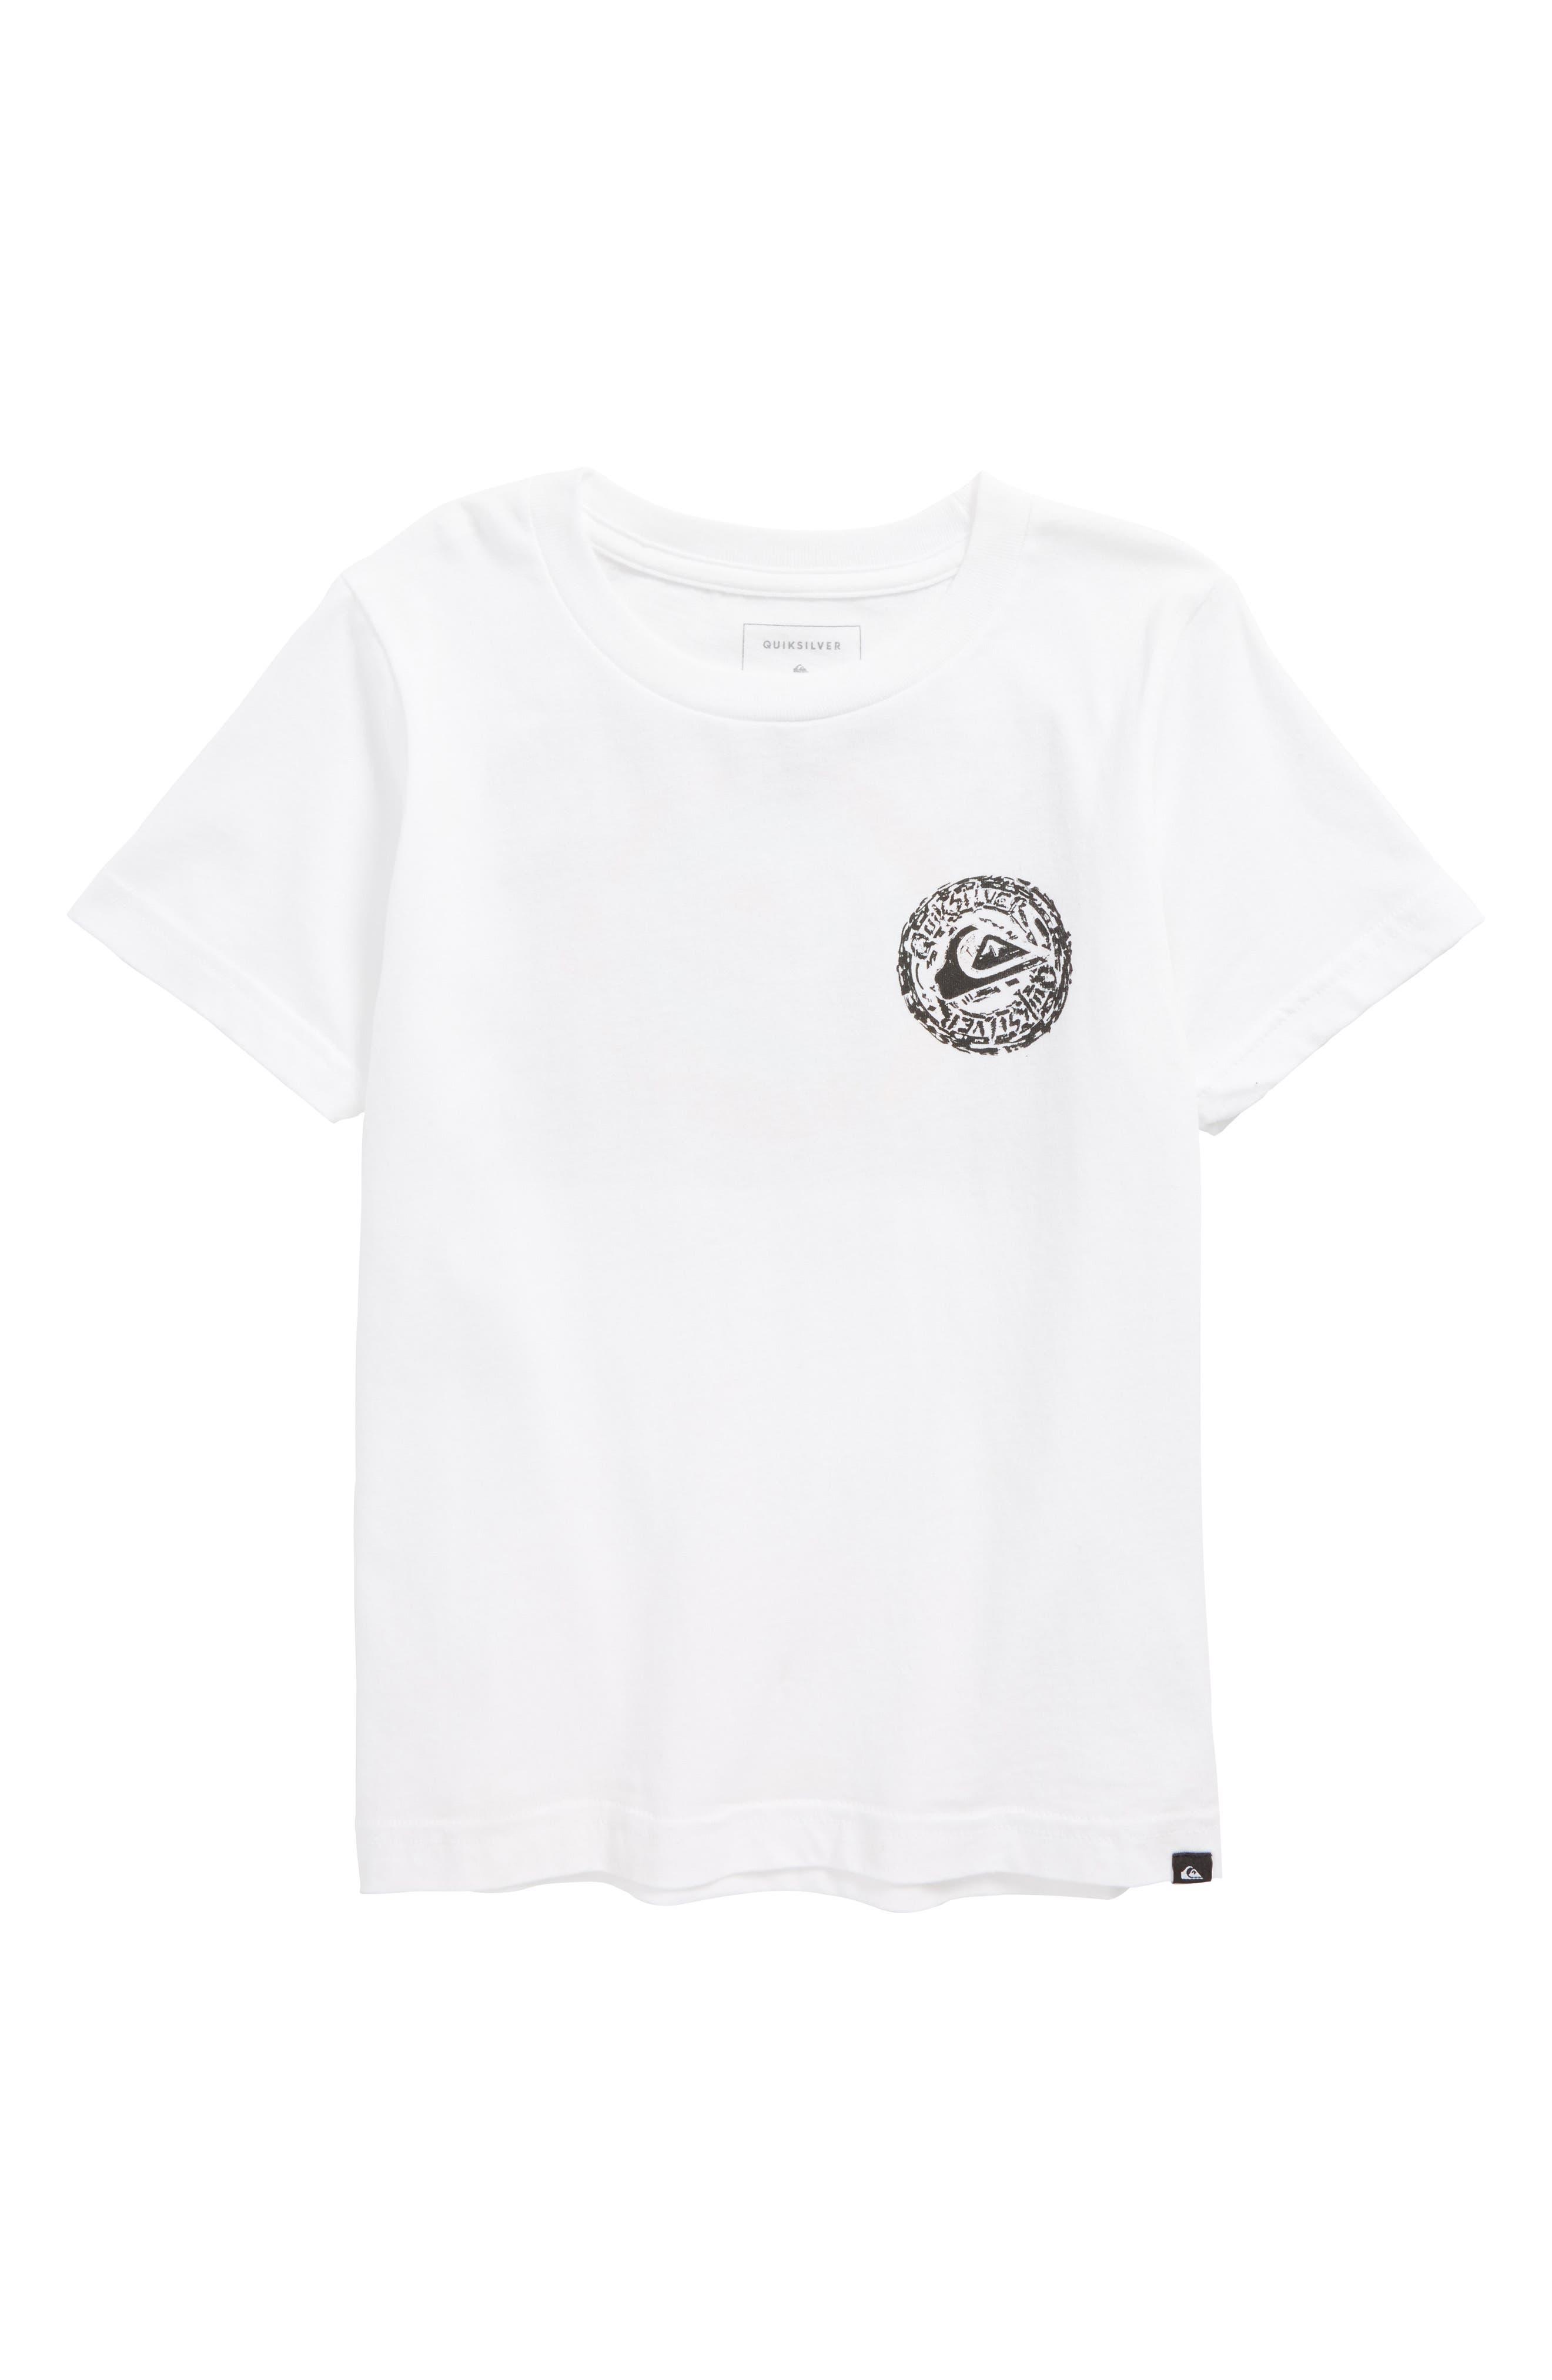 Elevens T-Shirt,                             Main thumbnail 1, color,                             101